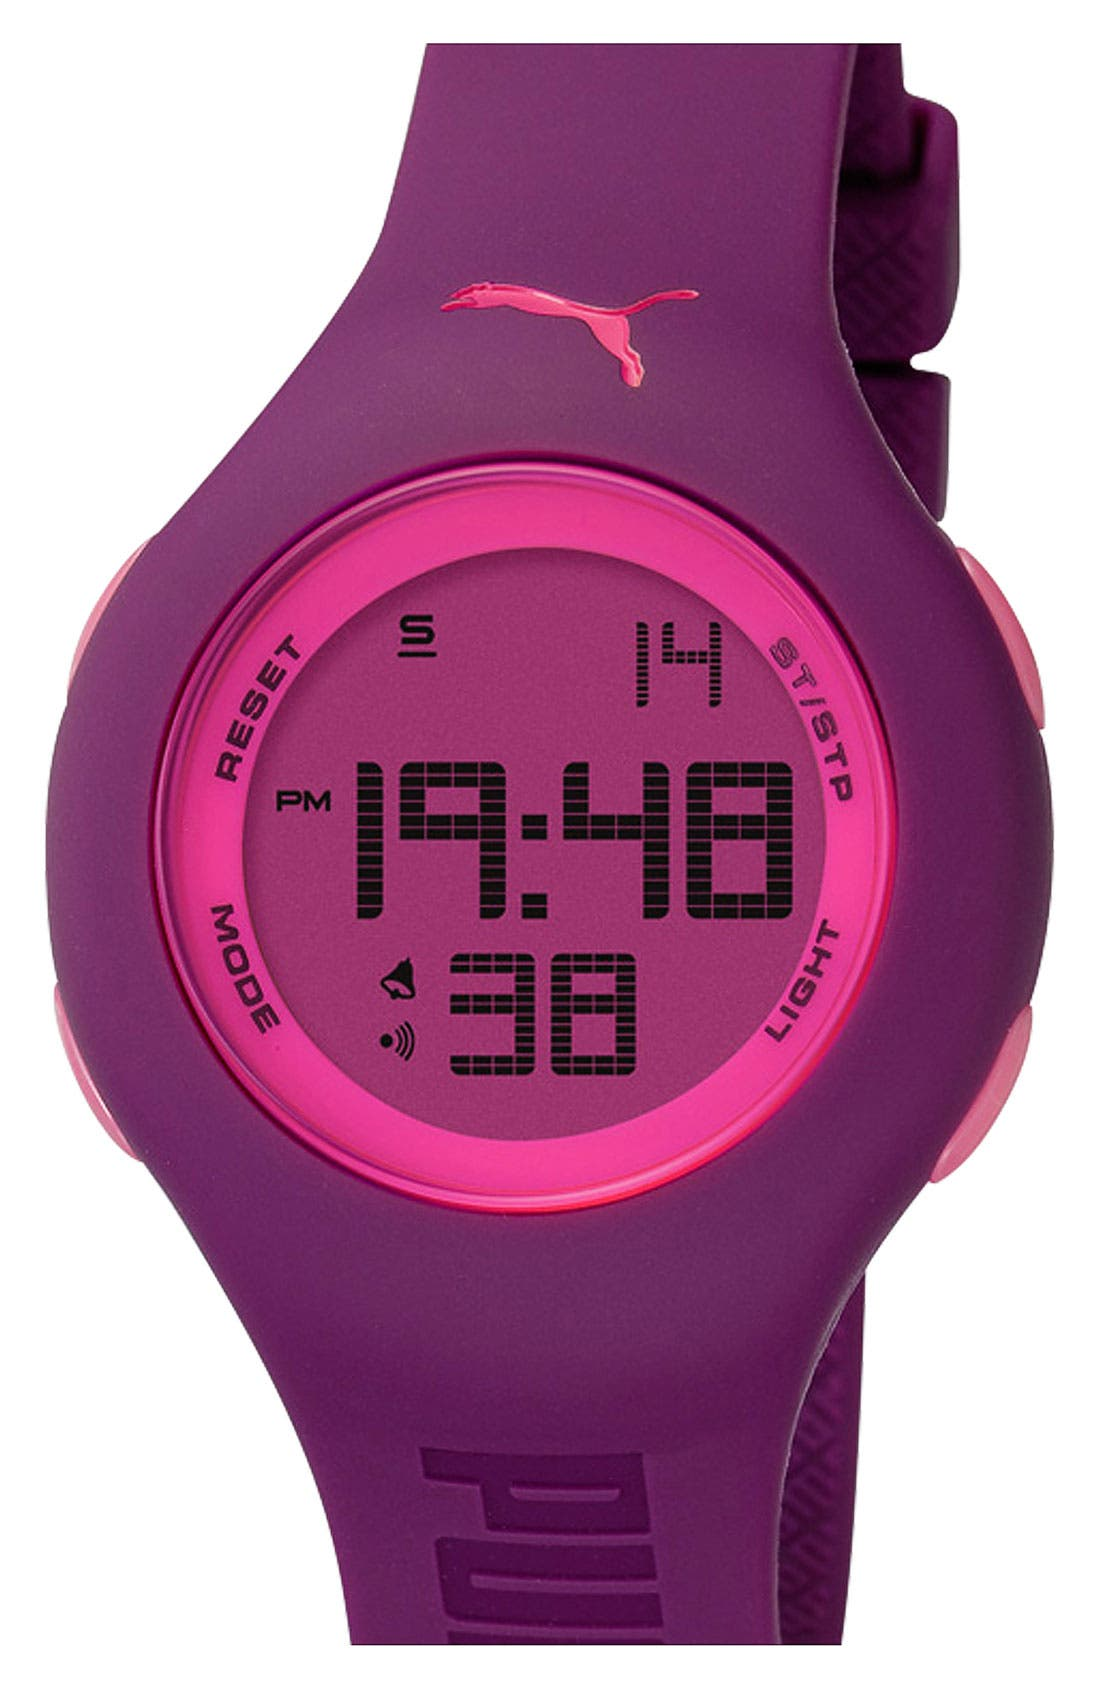 Main Image - PUMA 'Loop' Digital Chronograph Watch, 44mm